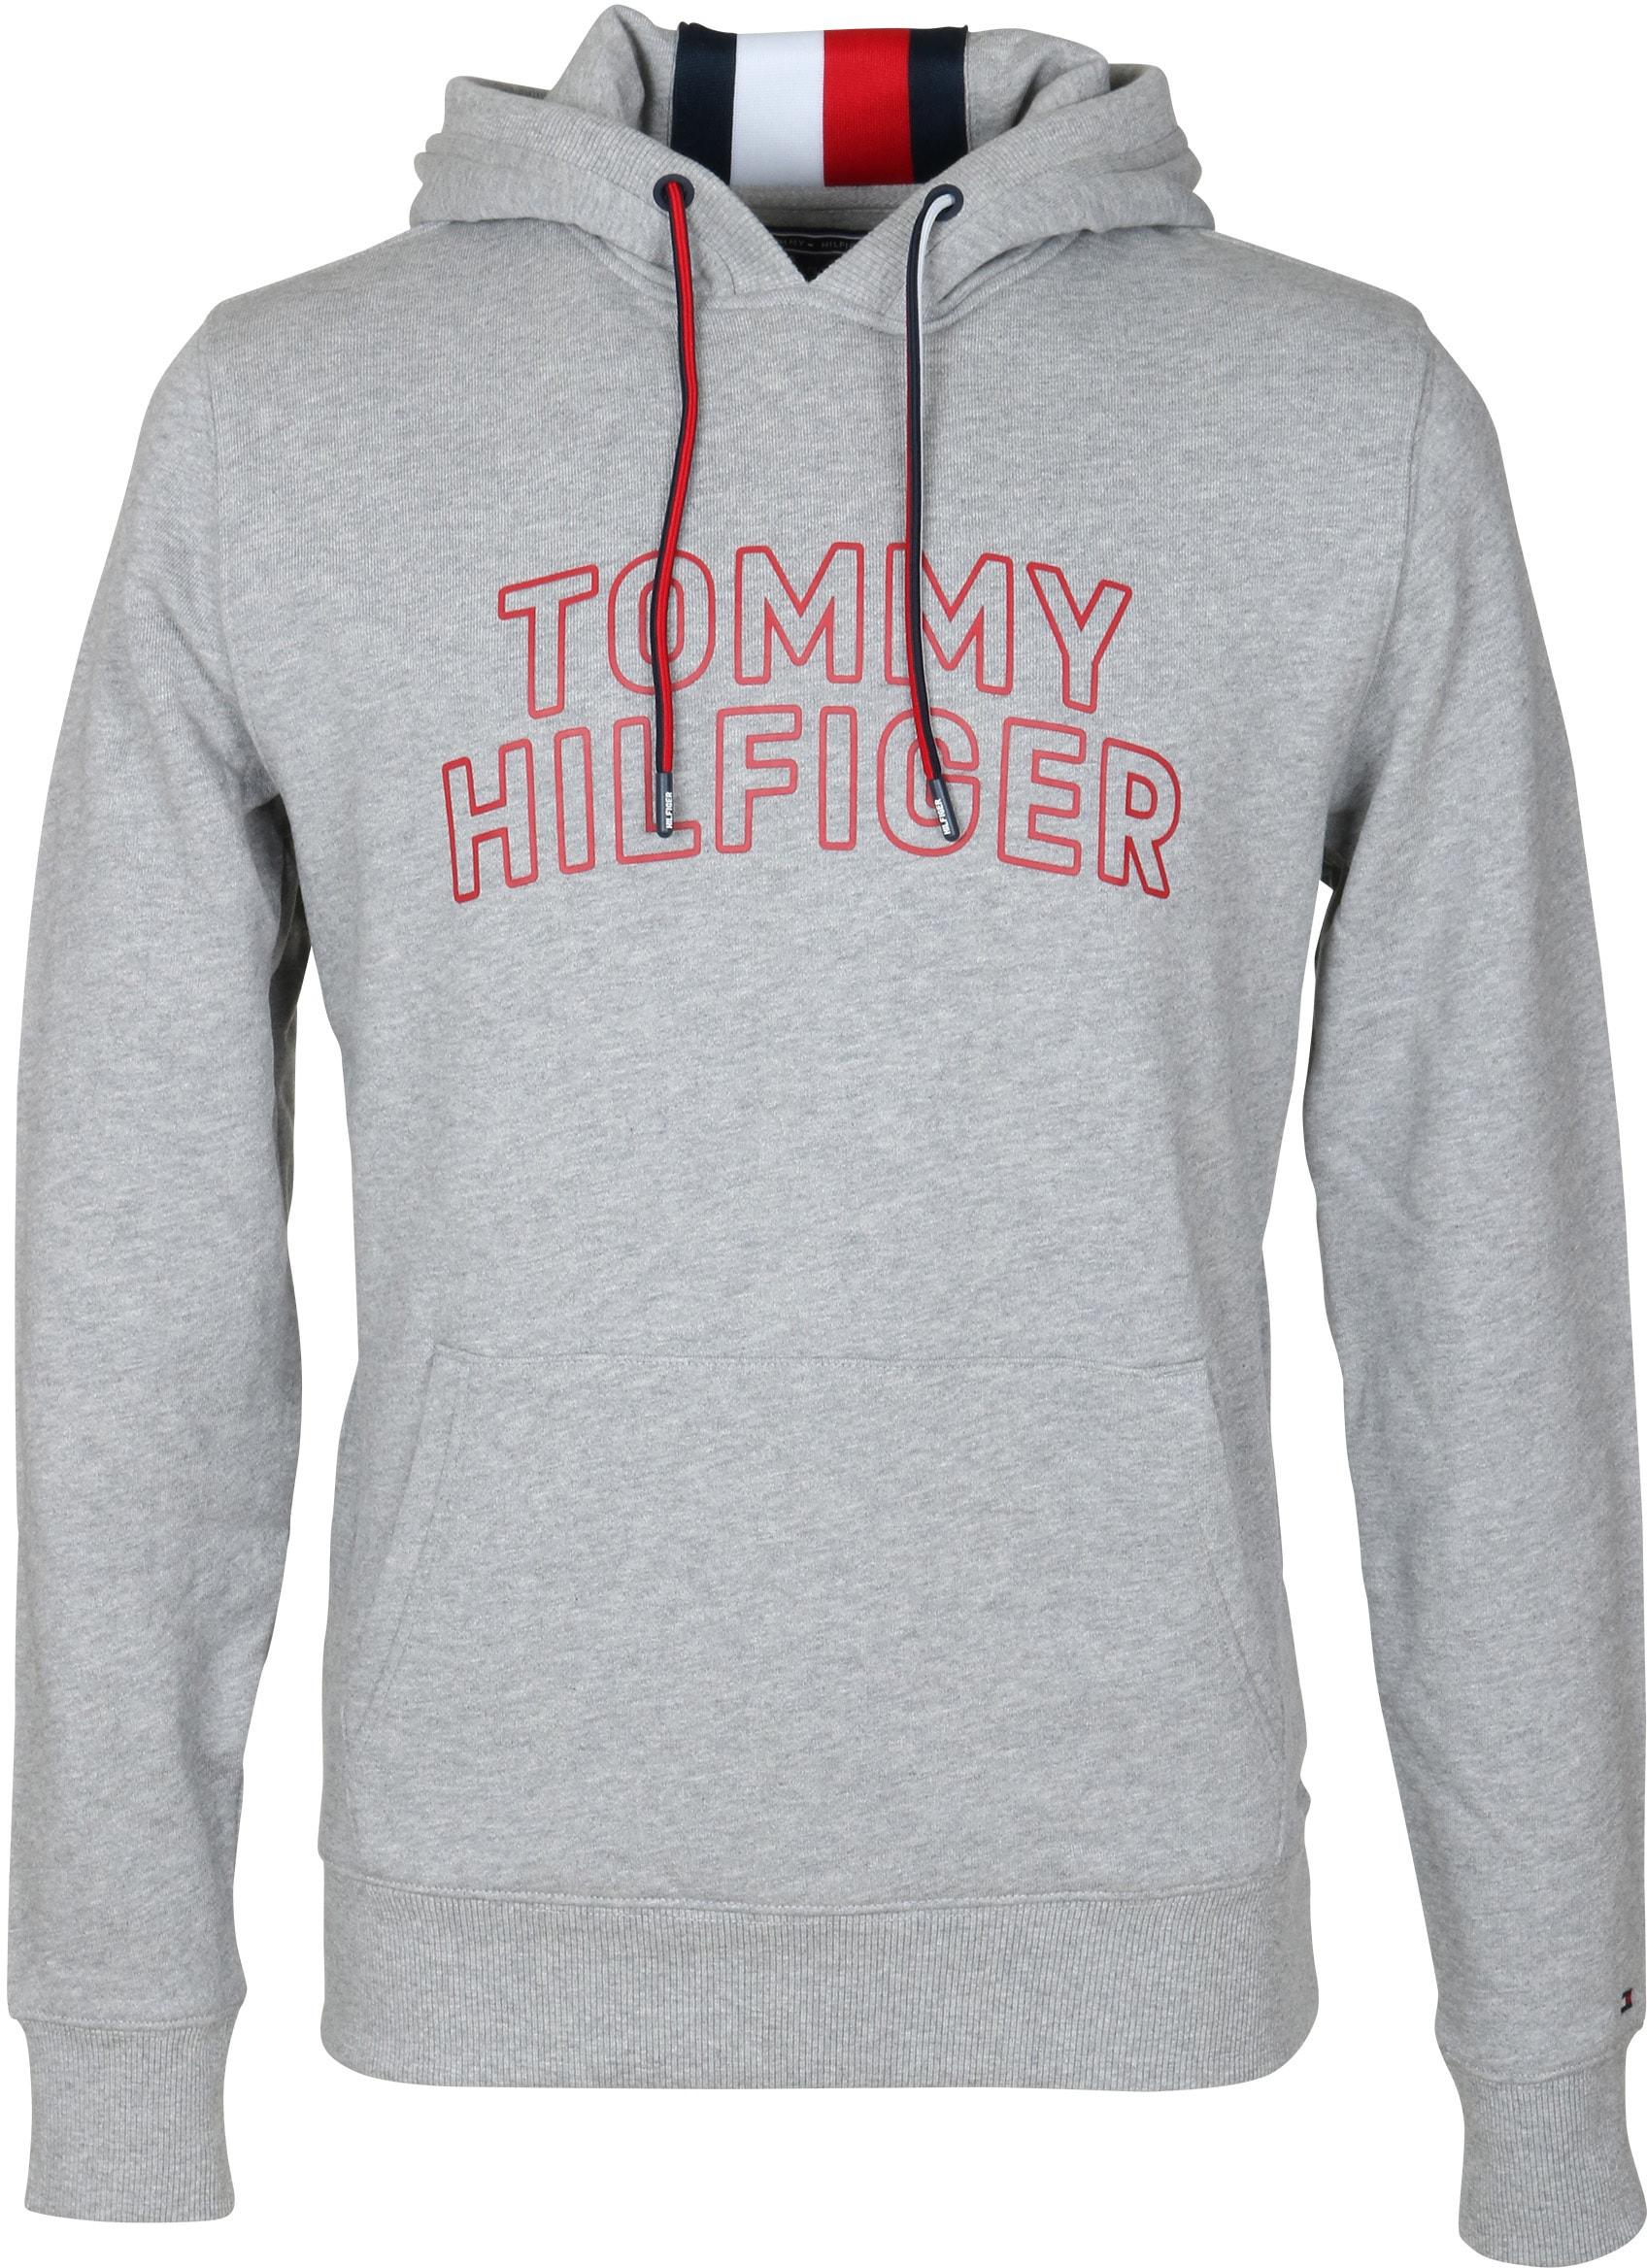 Tommy Hilfiger Hoodie Grau foto 0